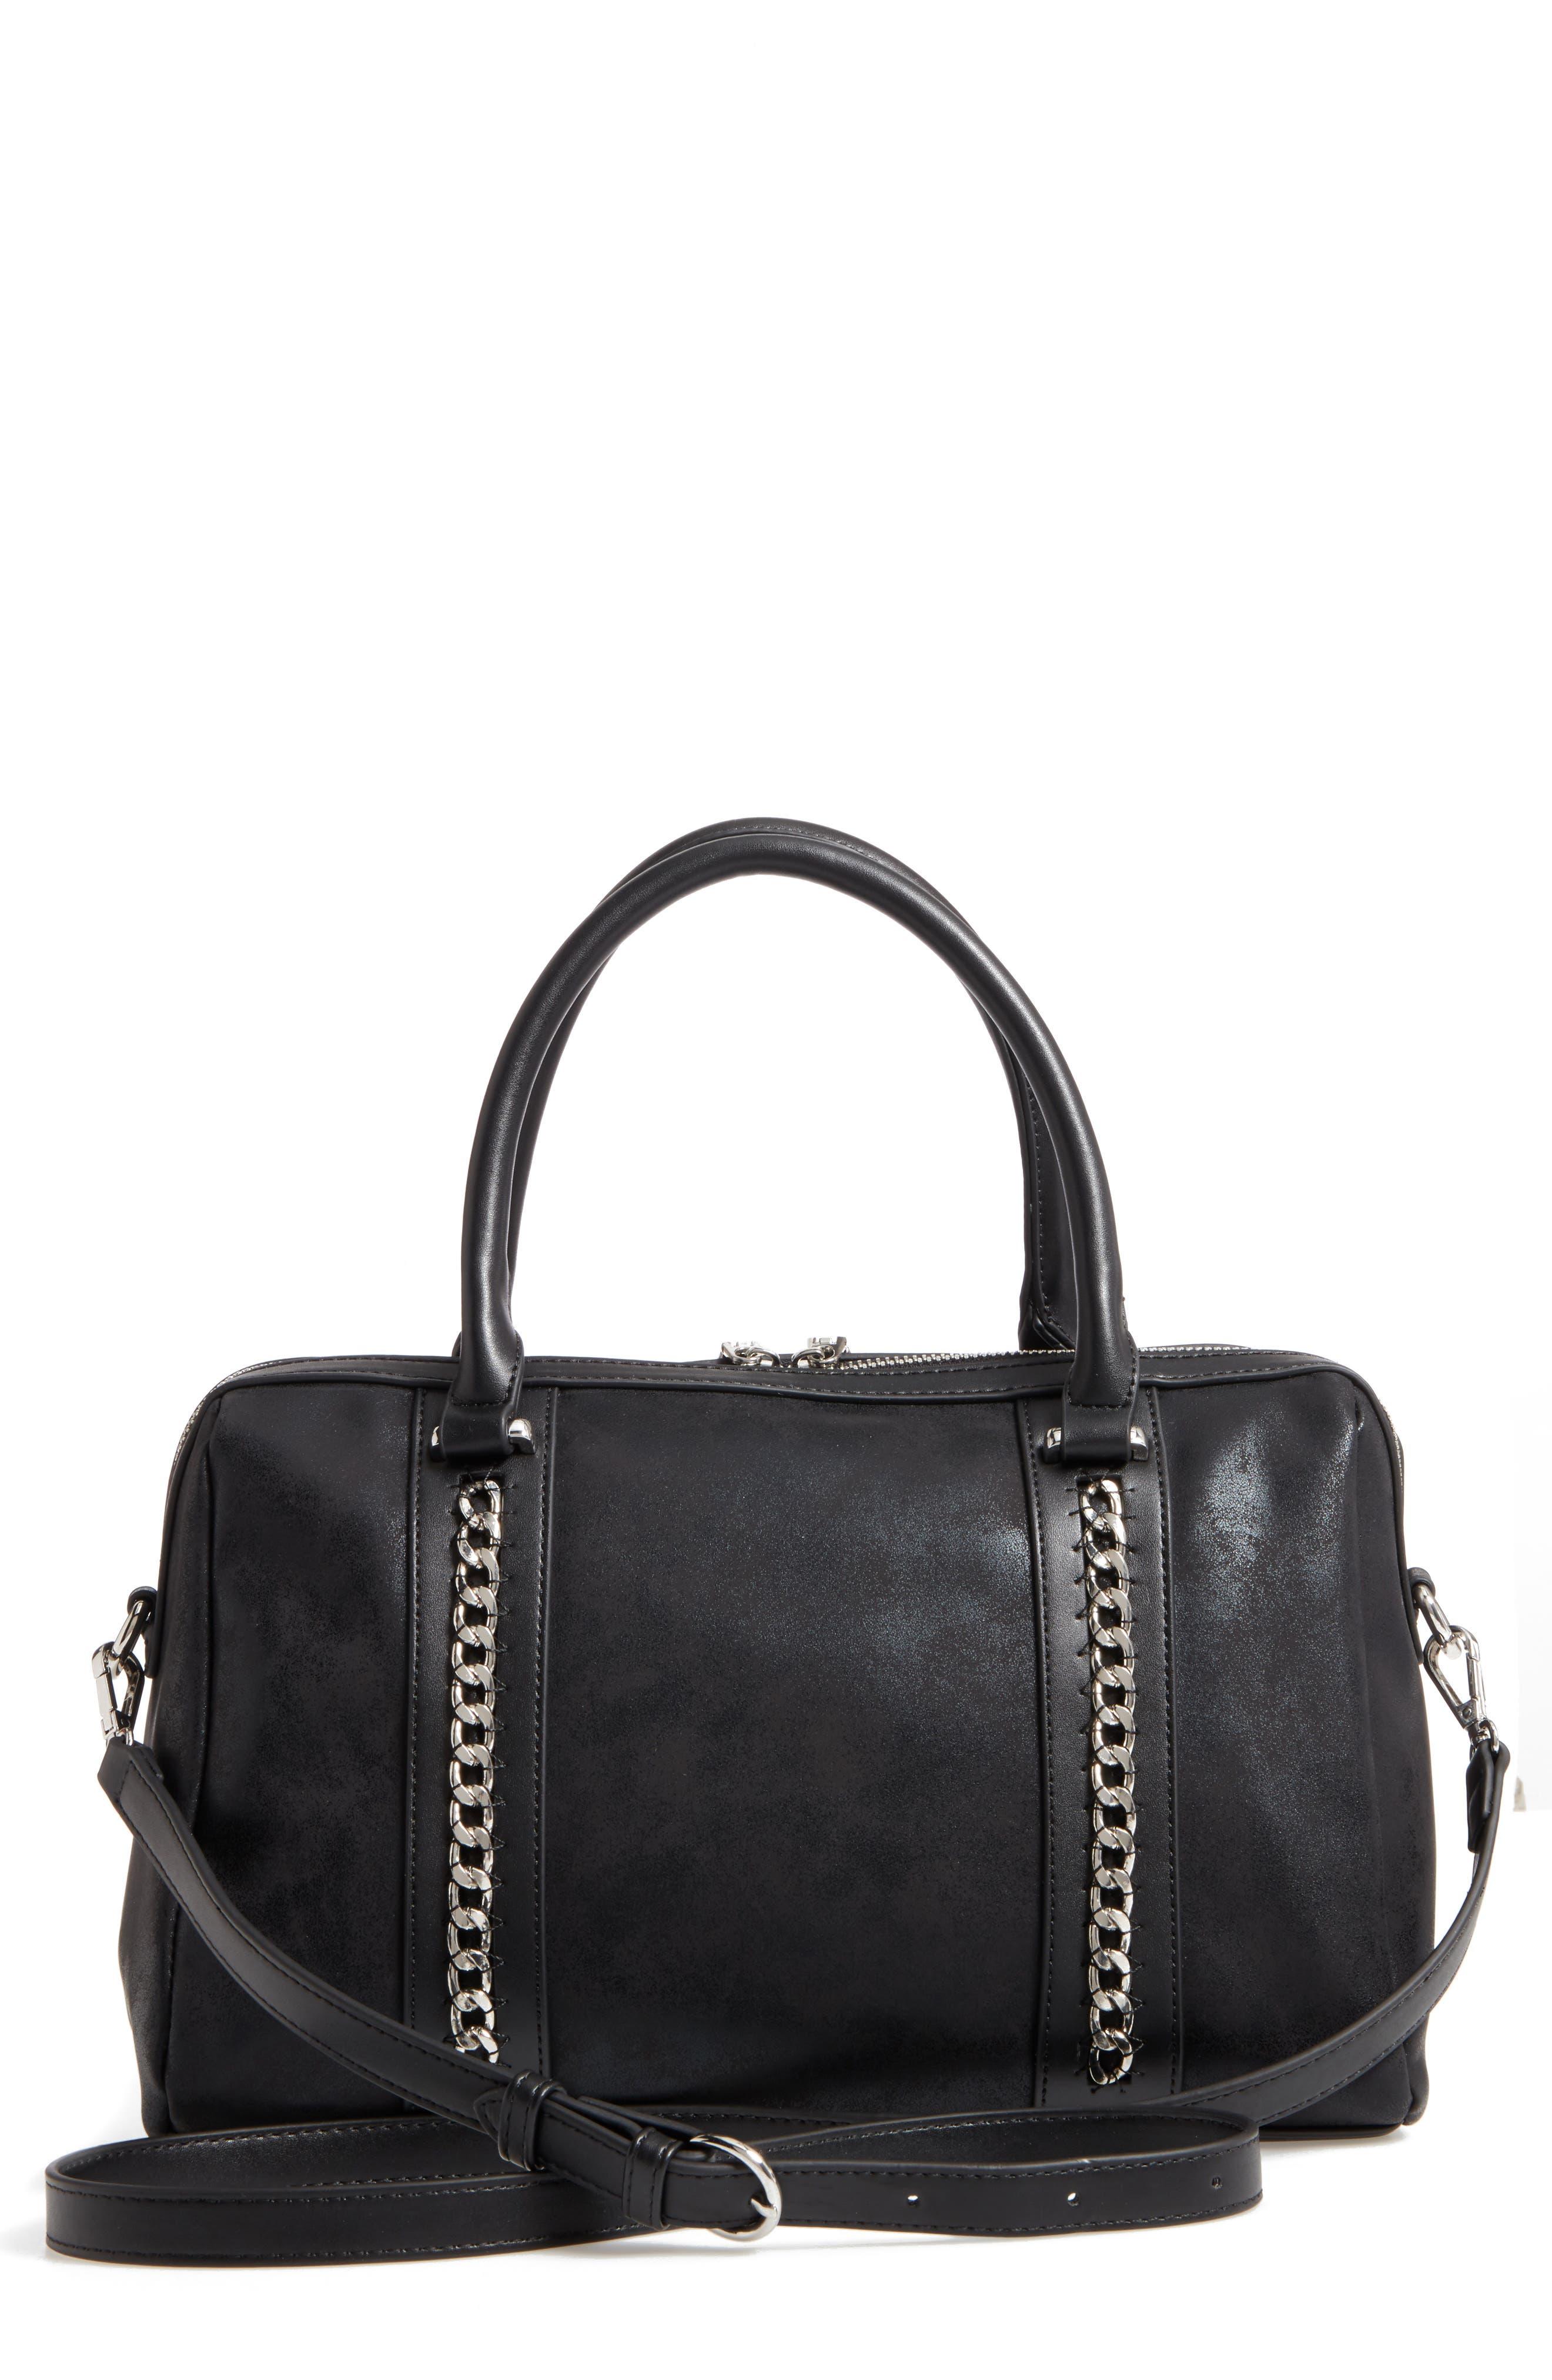 Chelsea28 Karlie Faux Leather Satchel